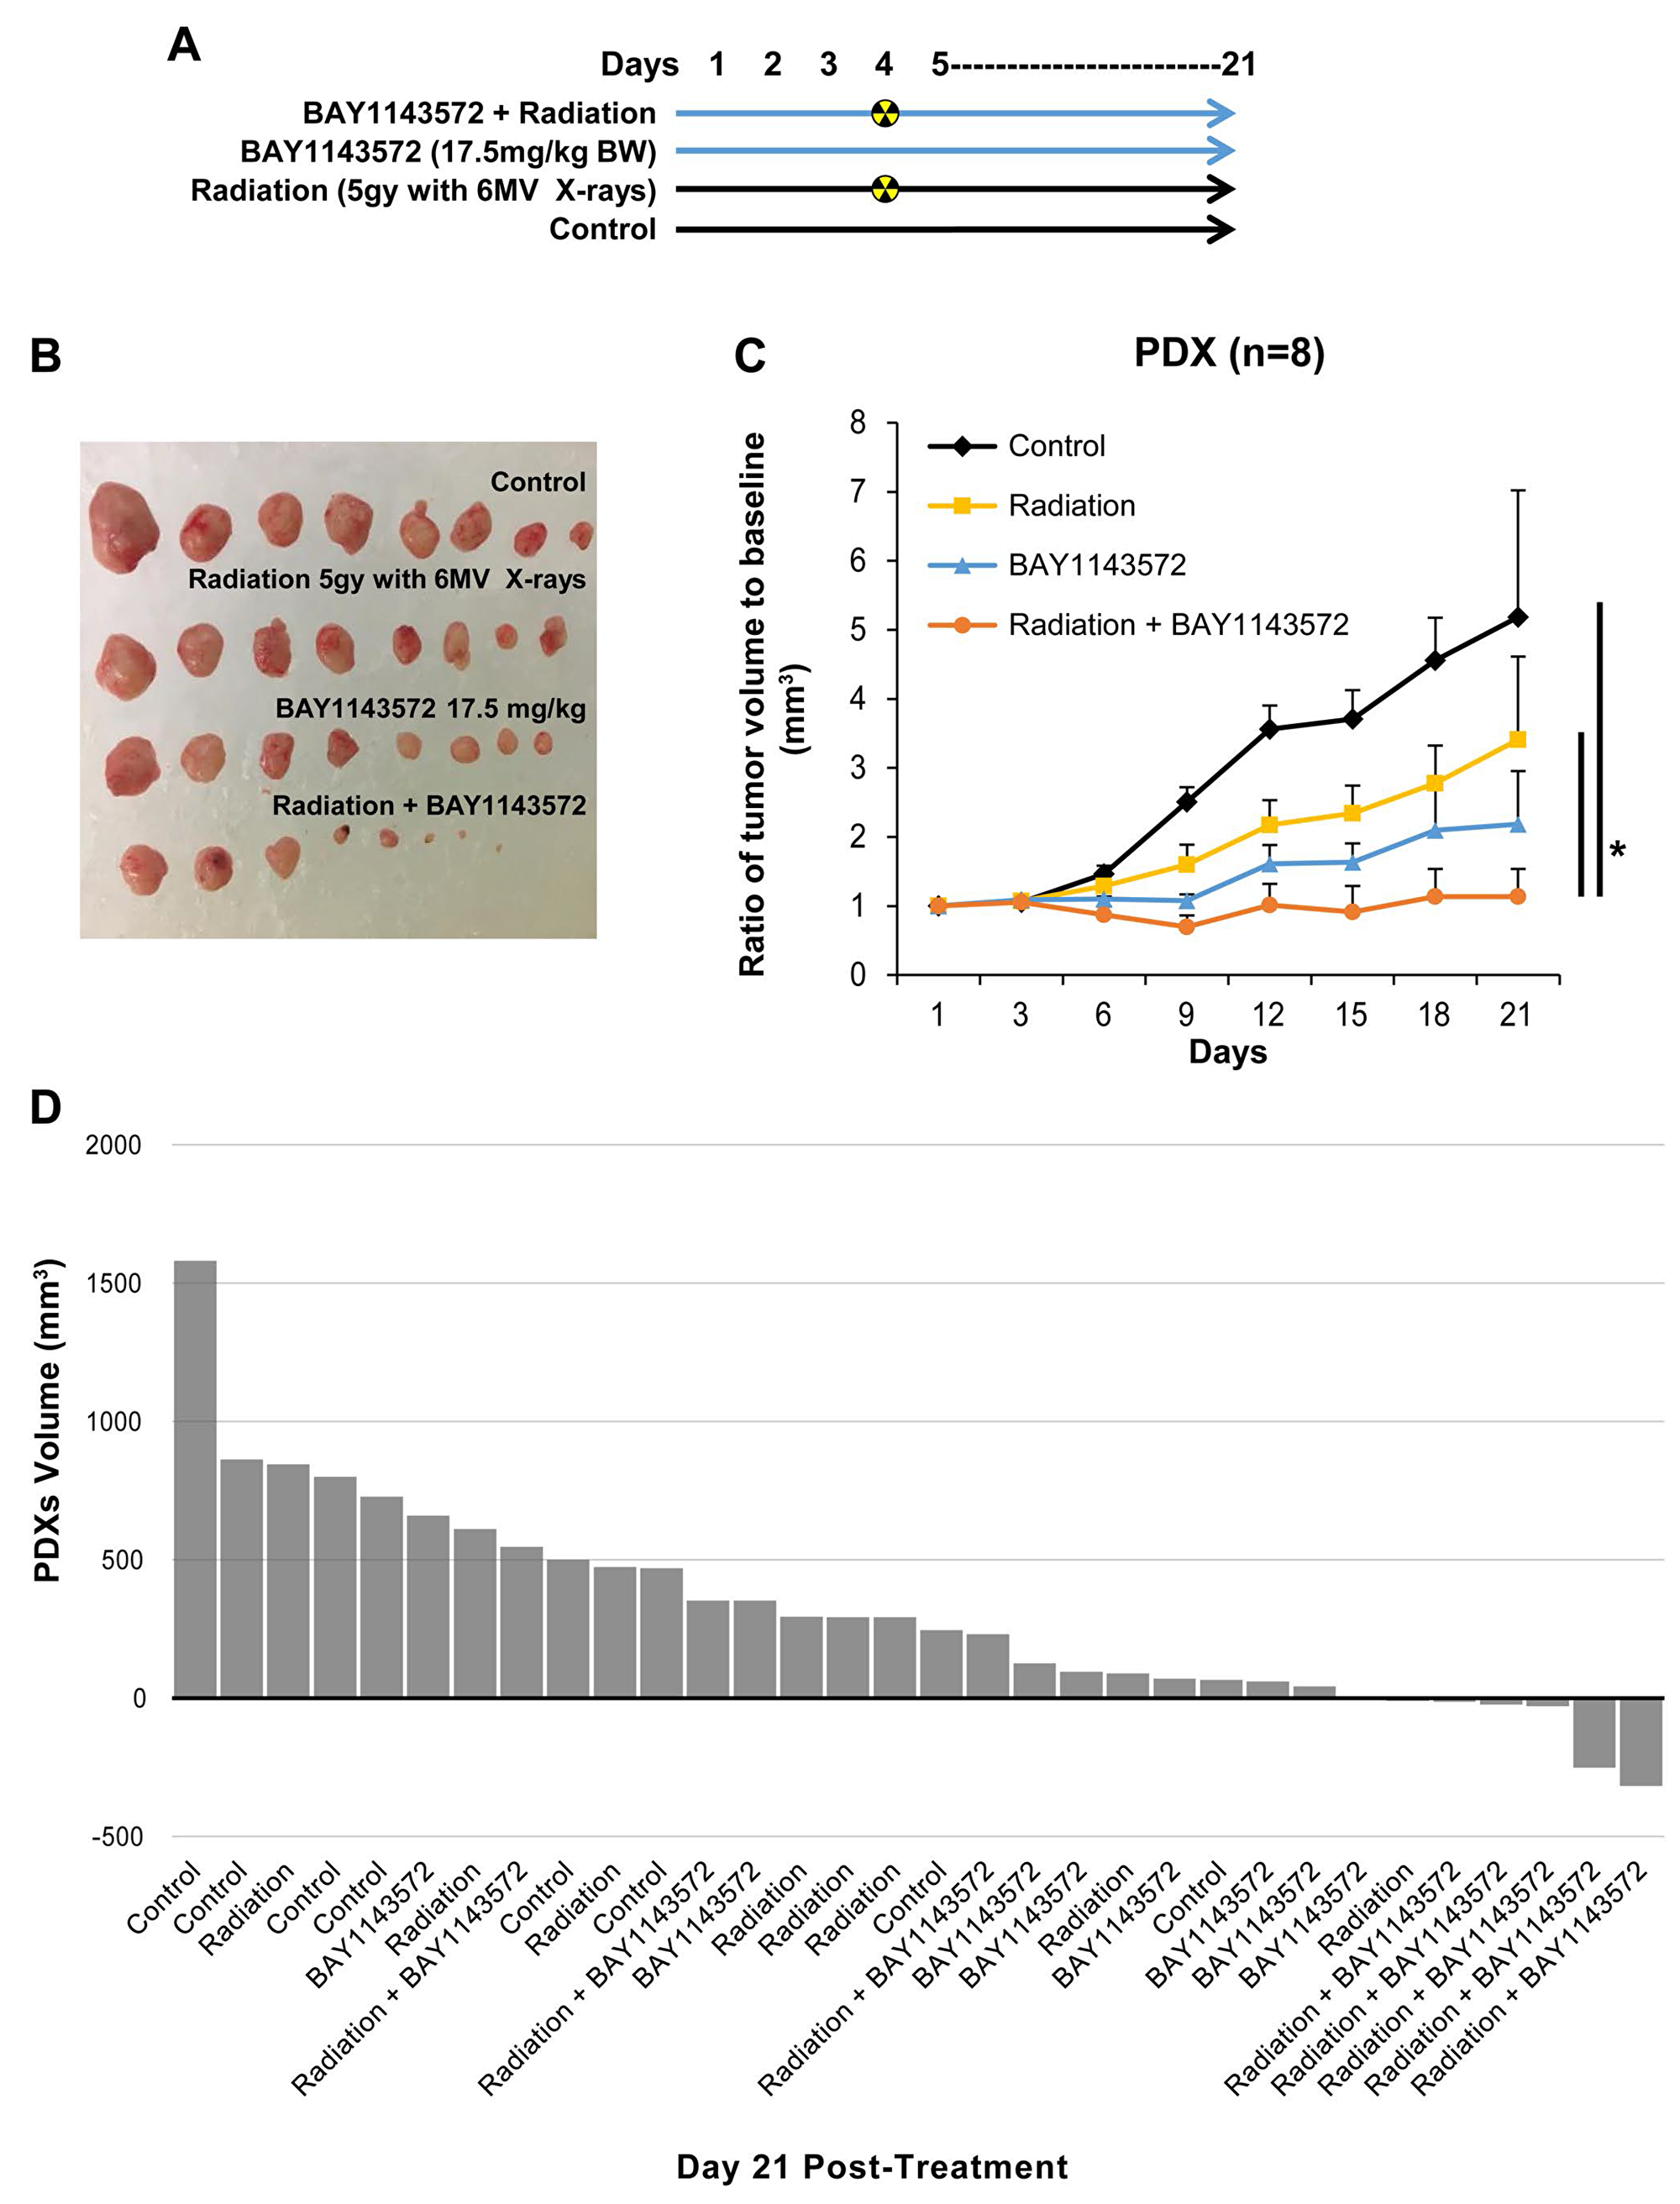 CDK9 inhibitor enhances sensitization of radiation in esophageal adenocarcinoma PDXs.